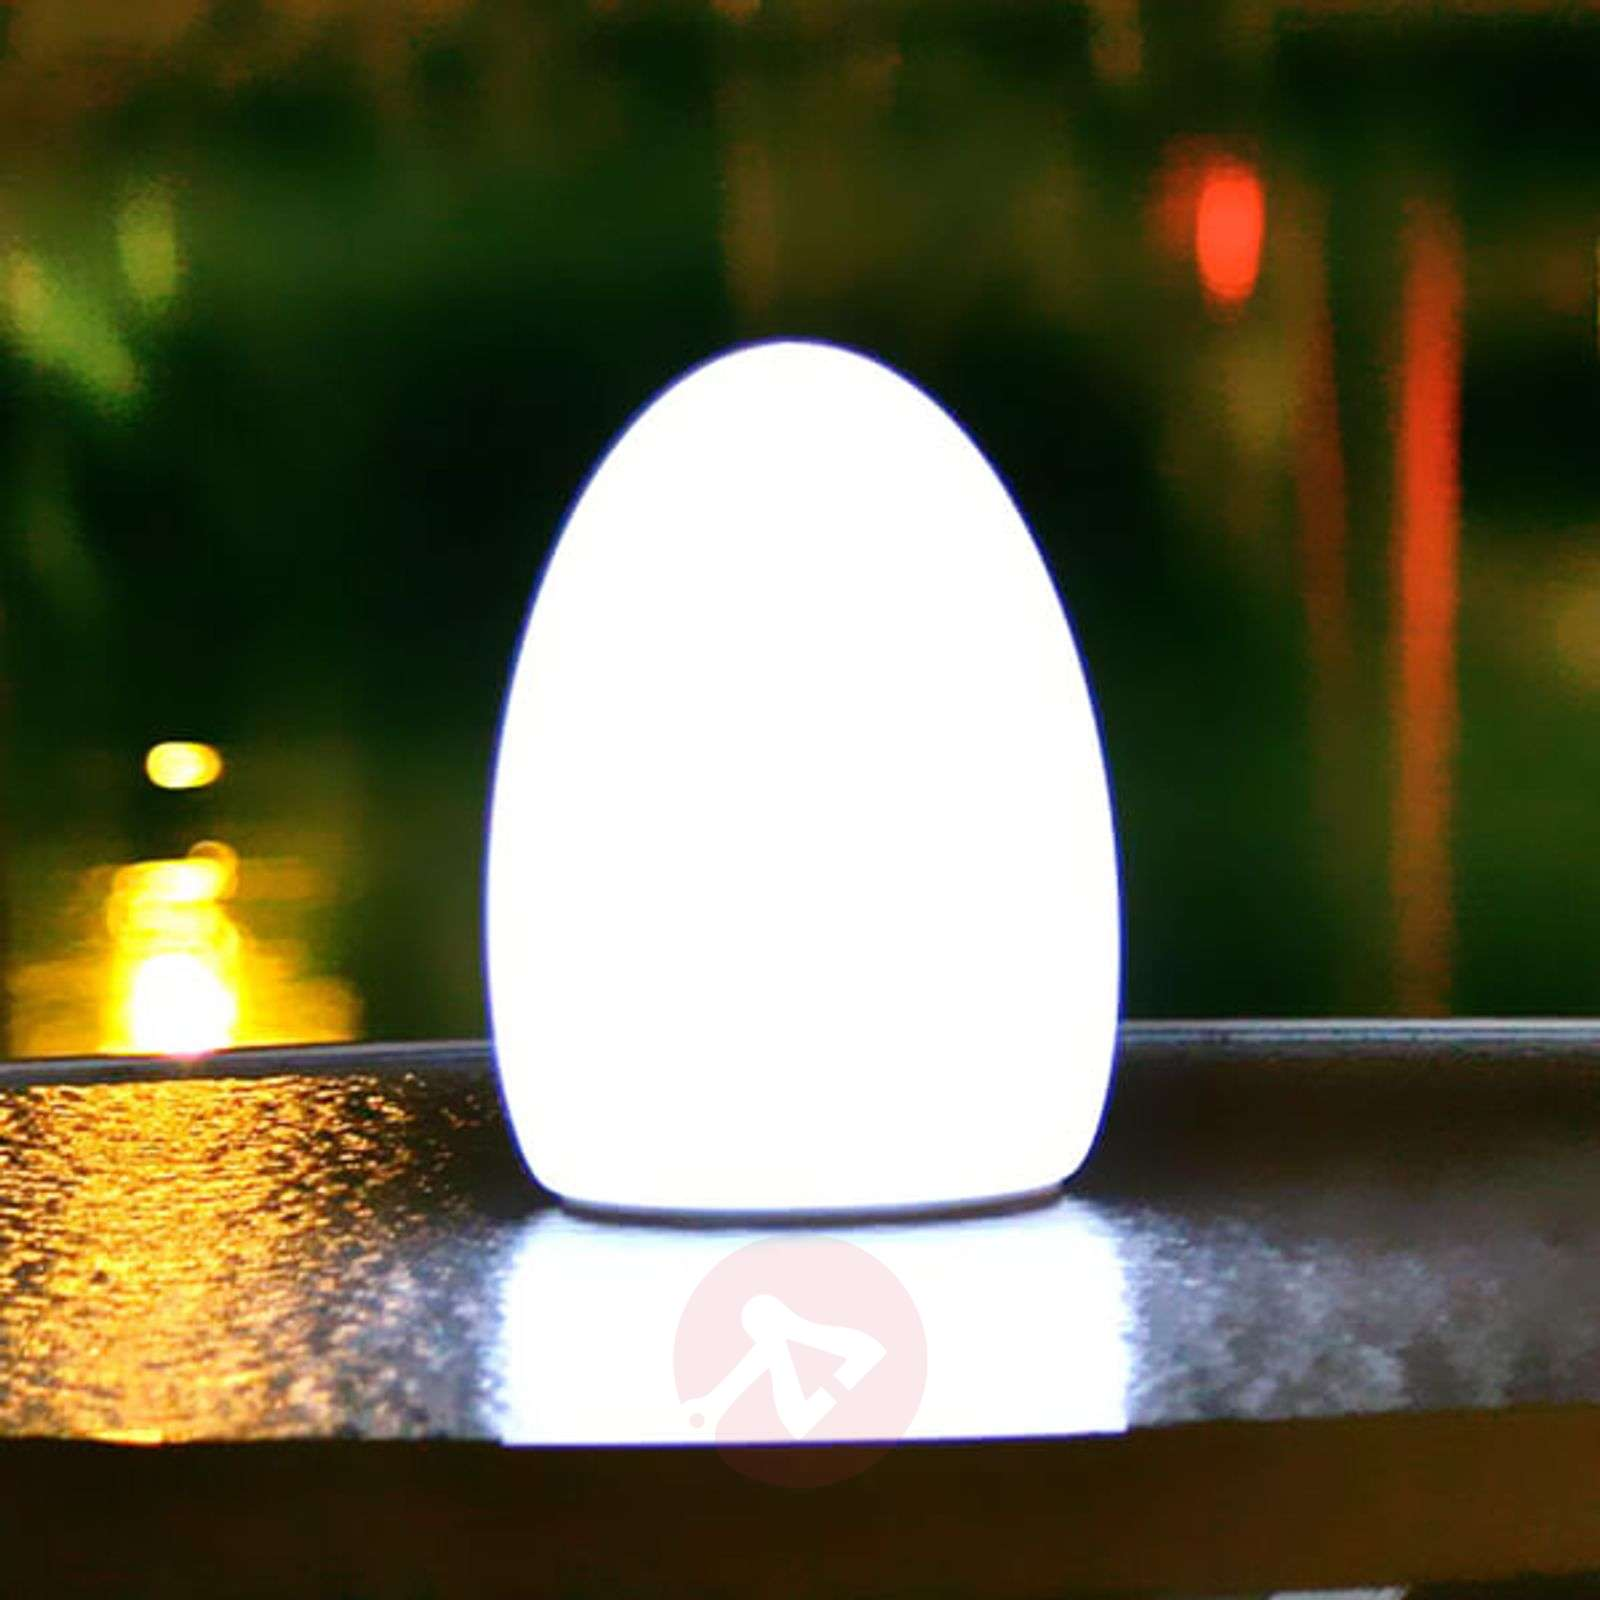 Egg decorative light, controllable via app-8590016-01